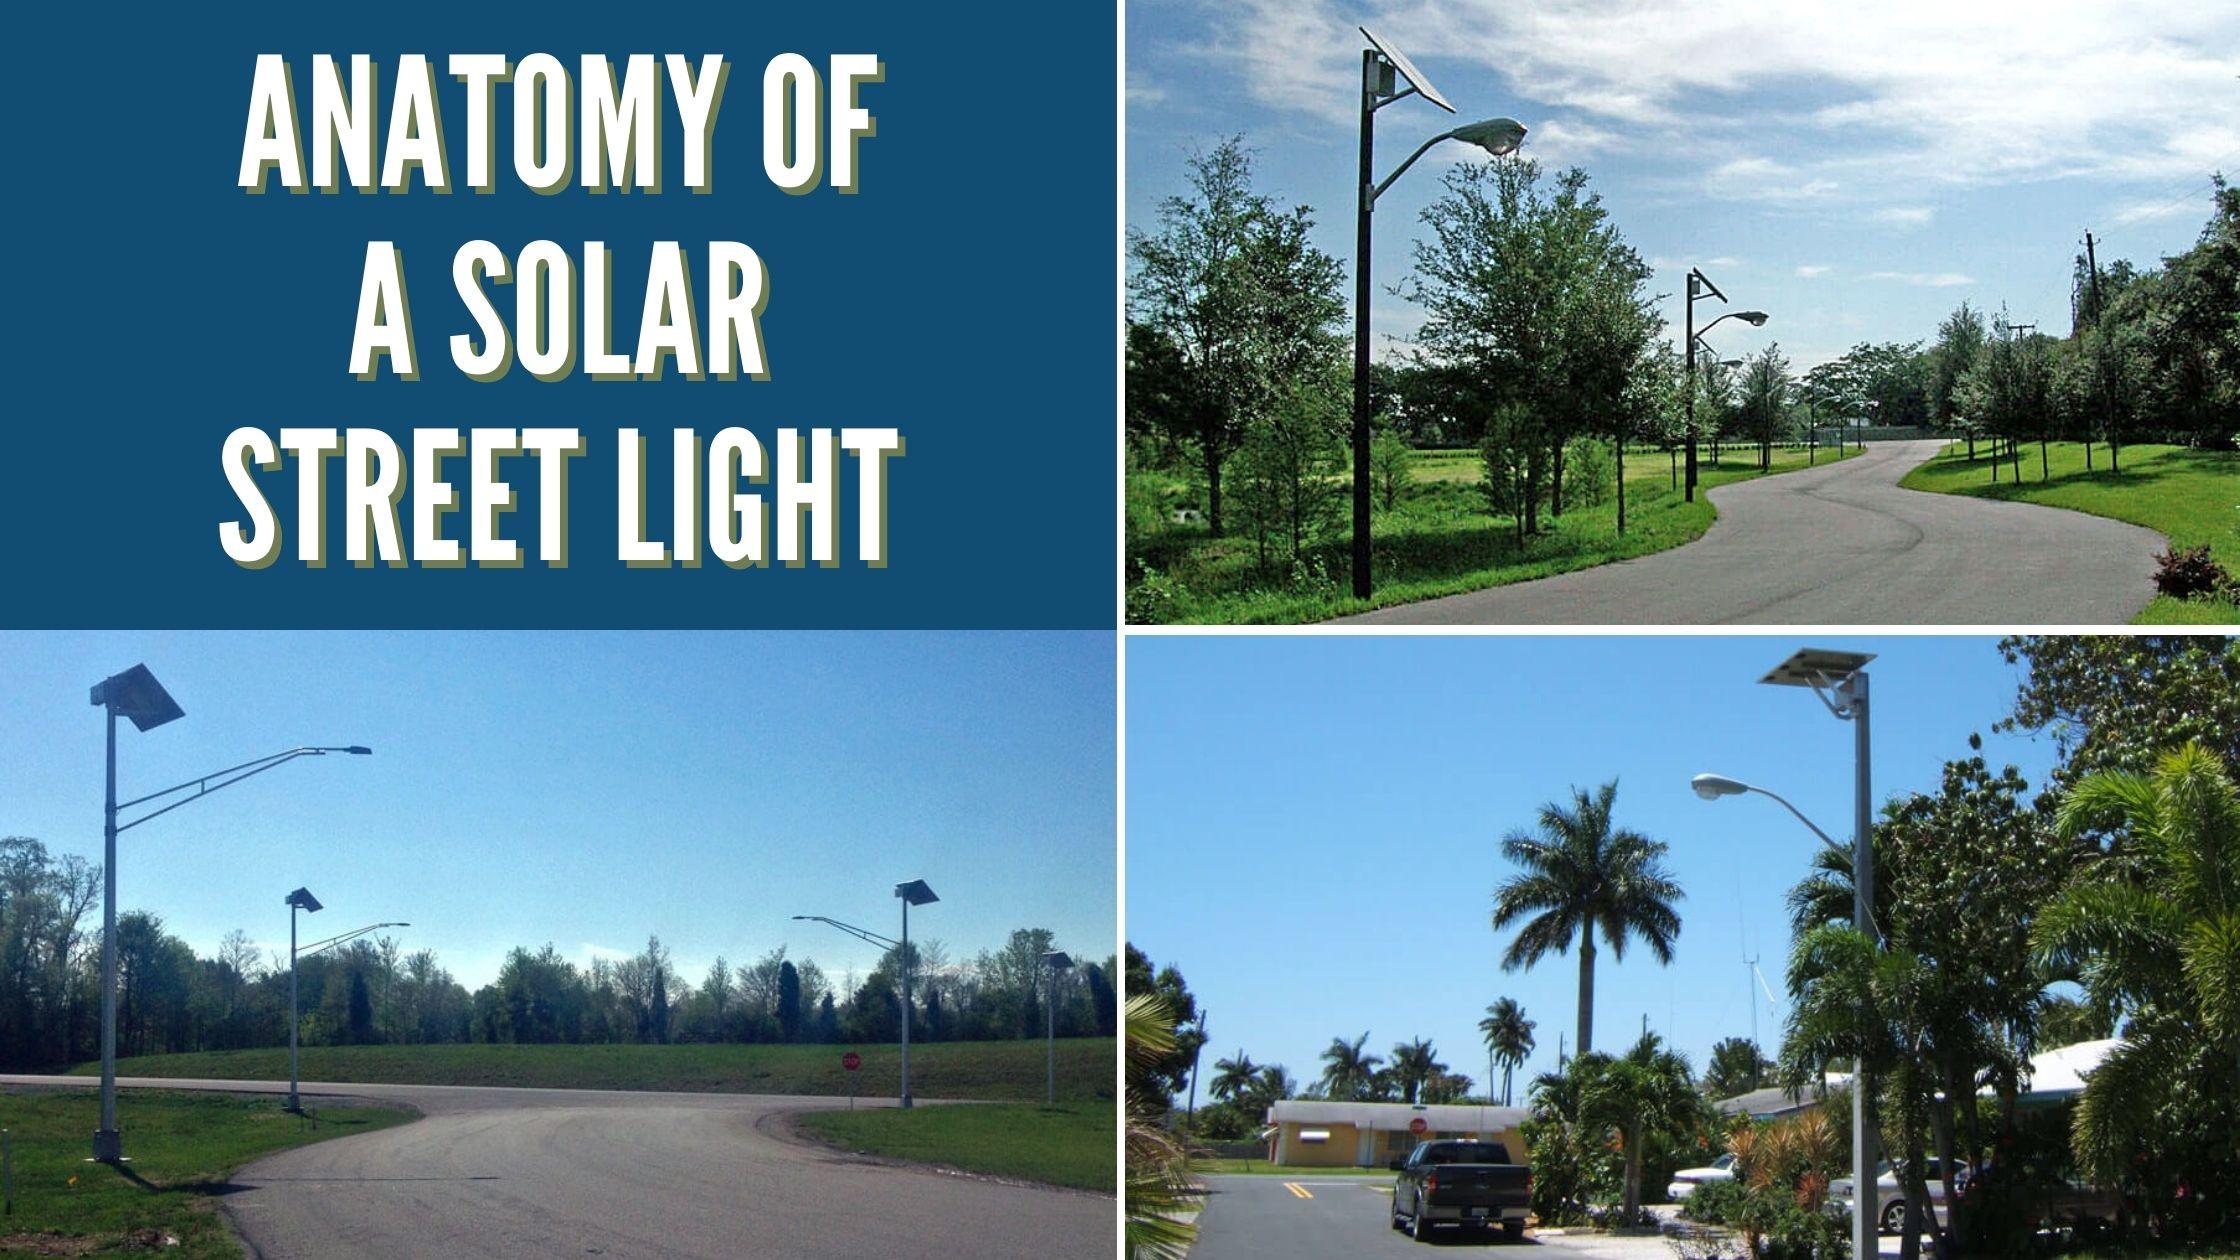 Anatomy of a Solar Street Light